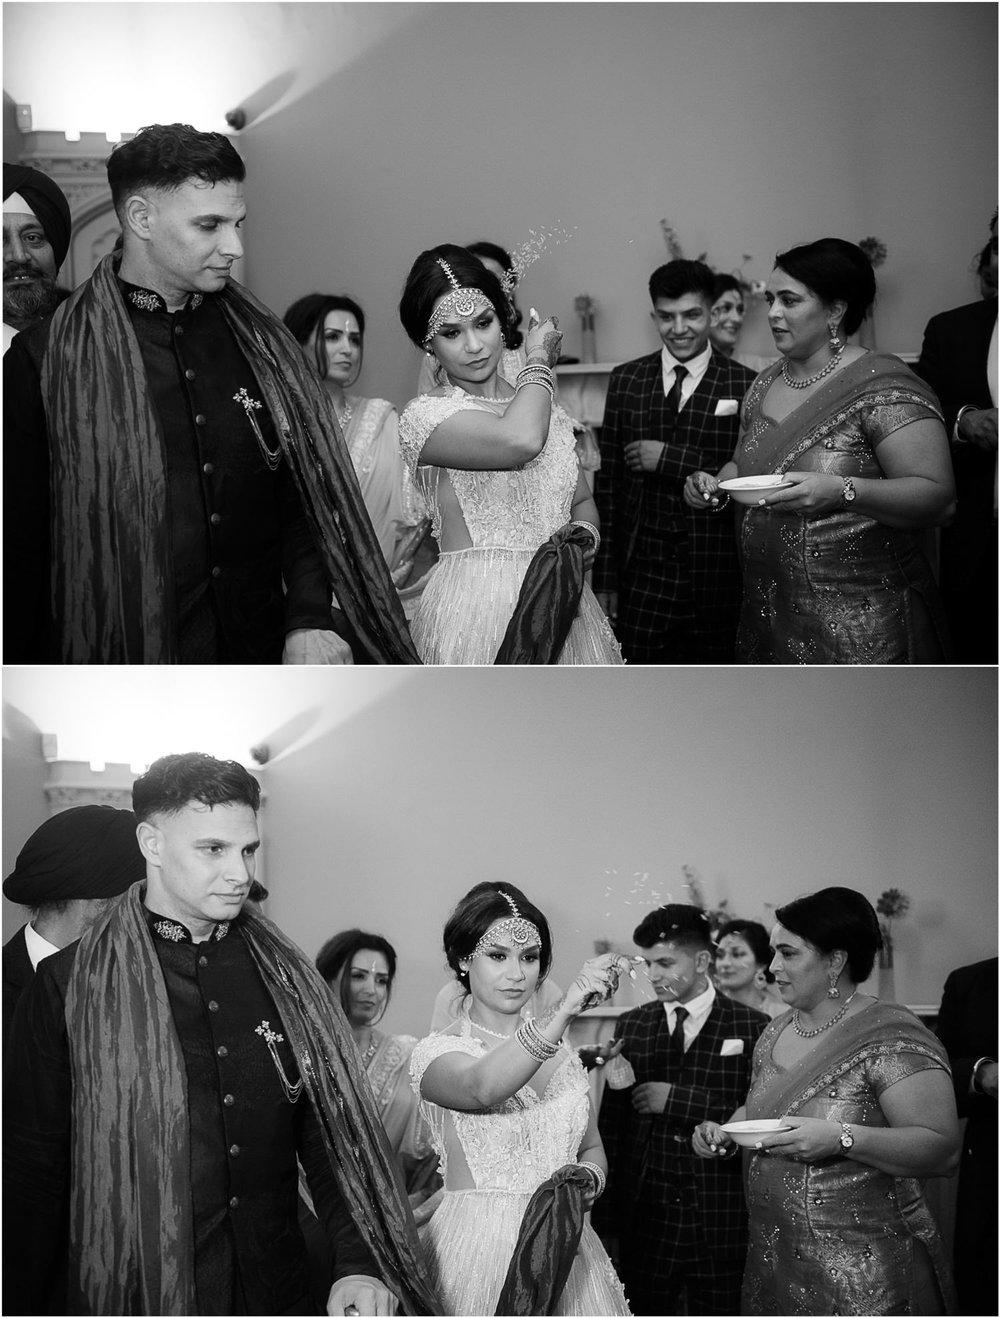 Doli and wedding